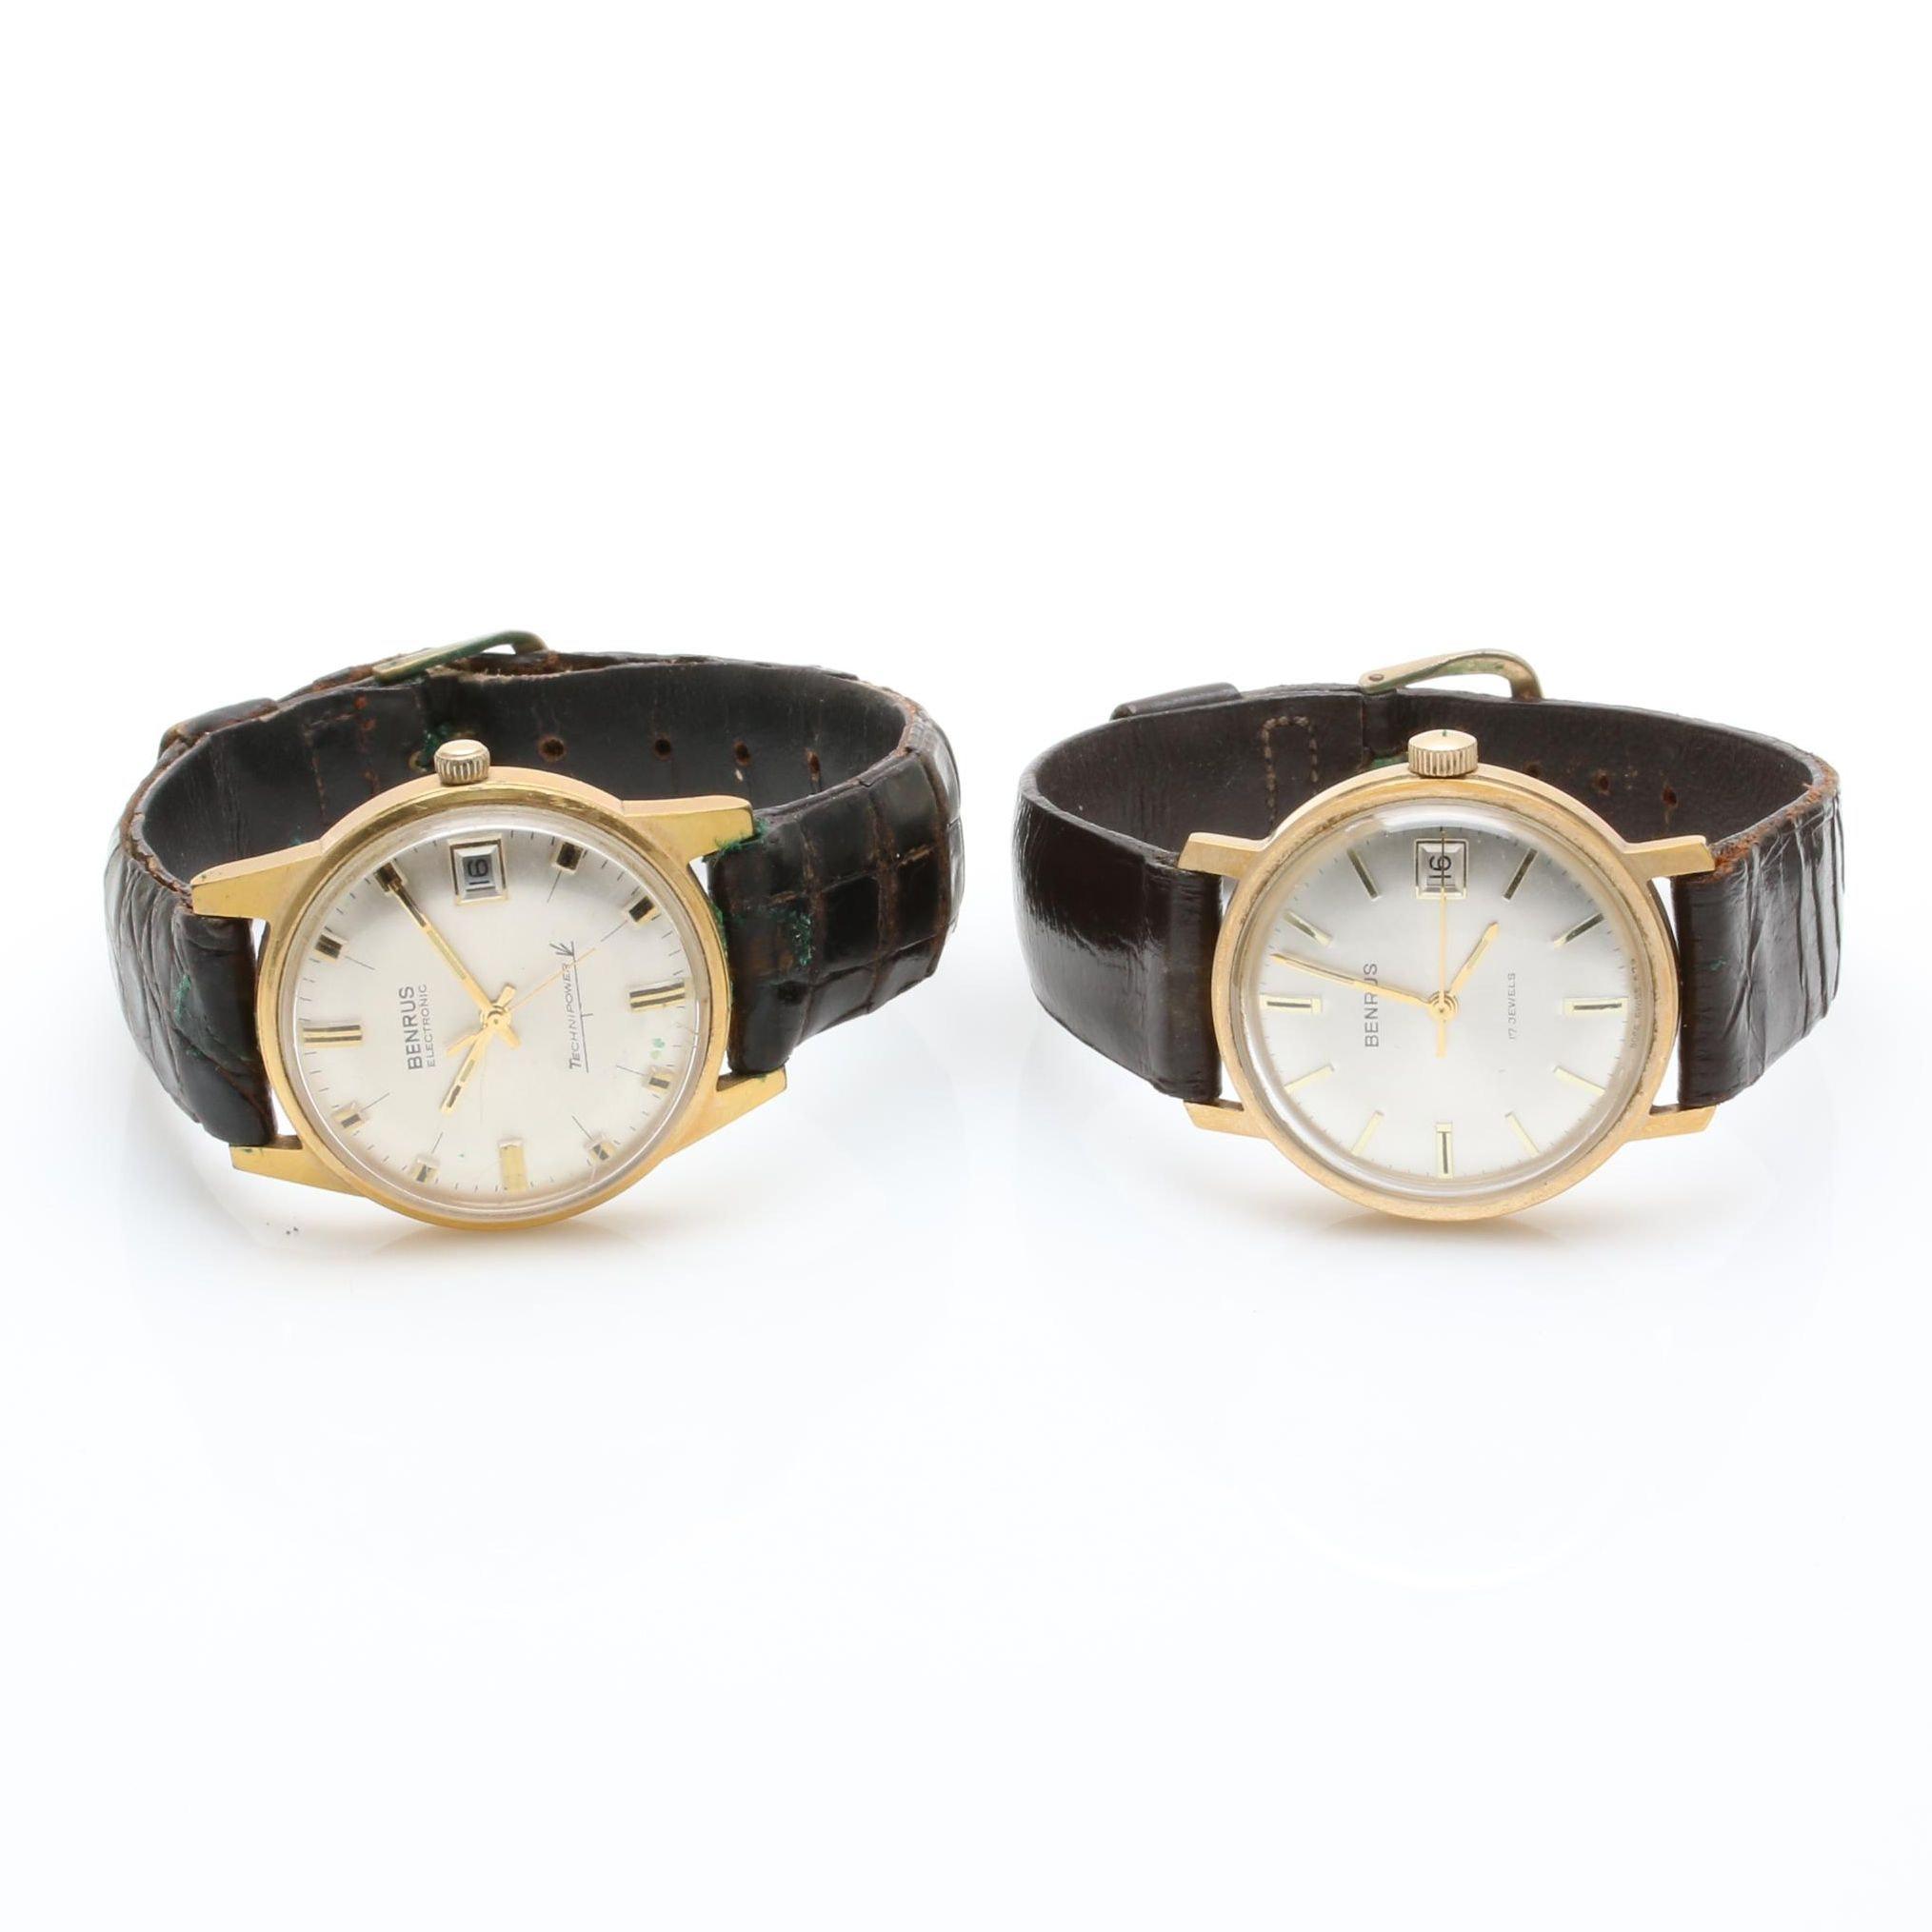 Gold Tone Benrus Wristwatch Assortment